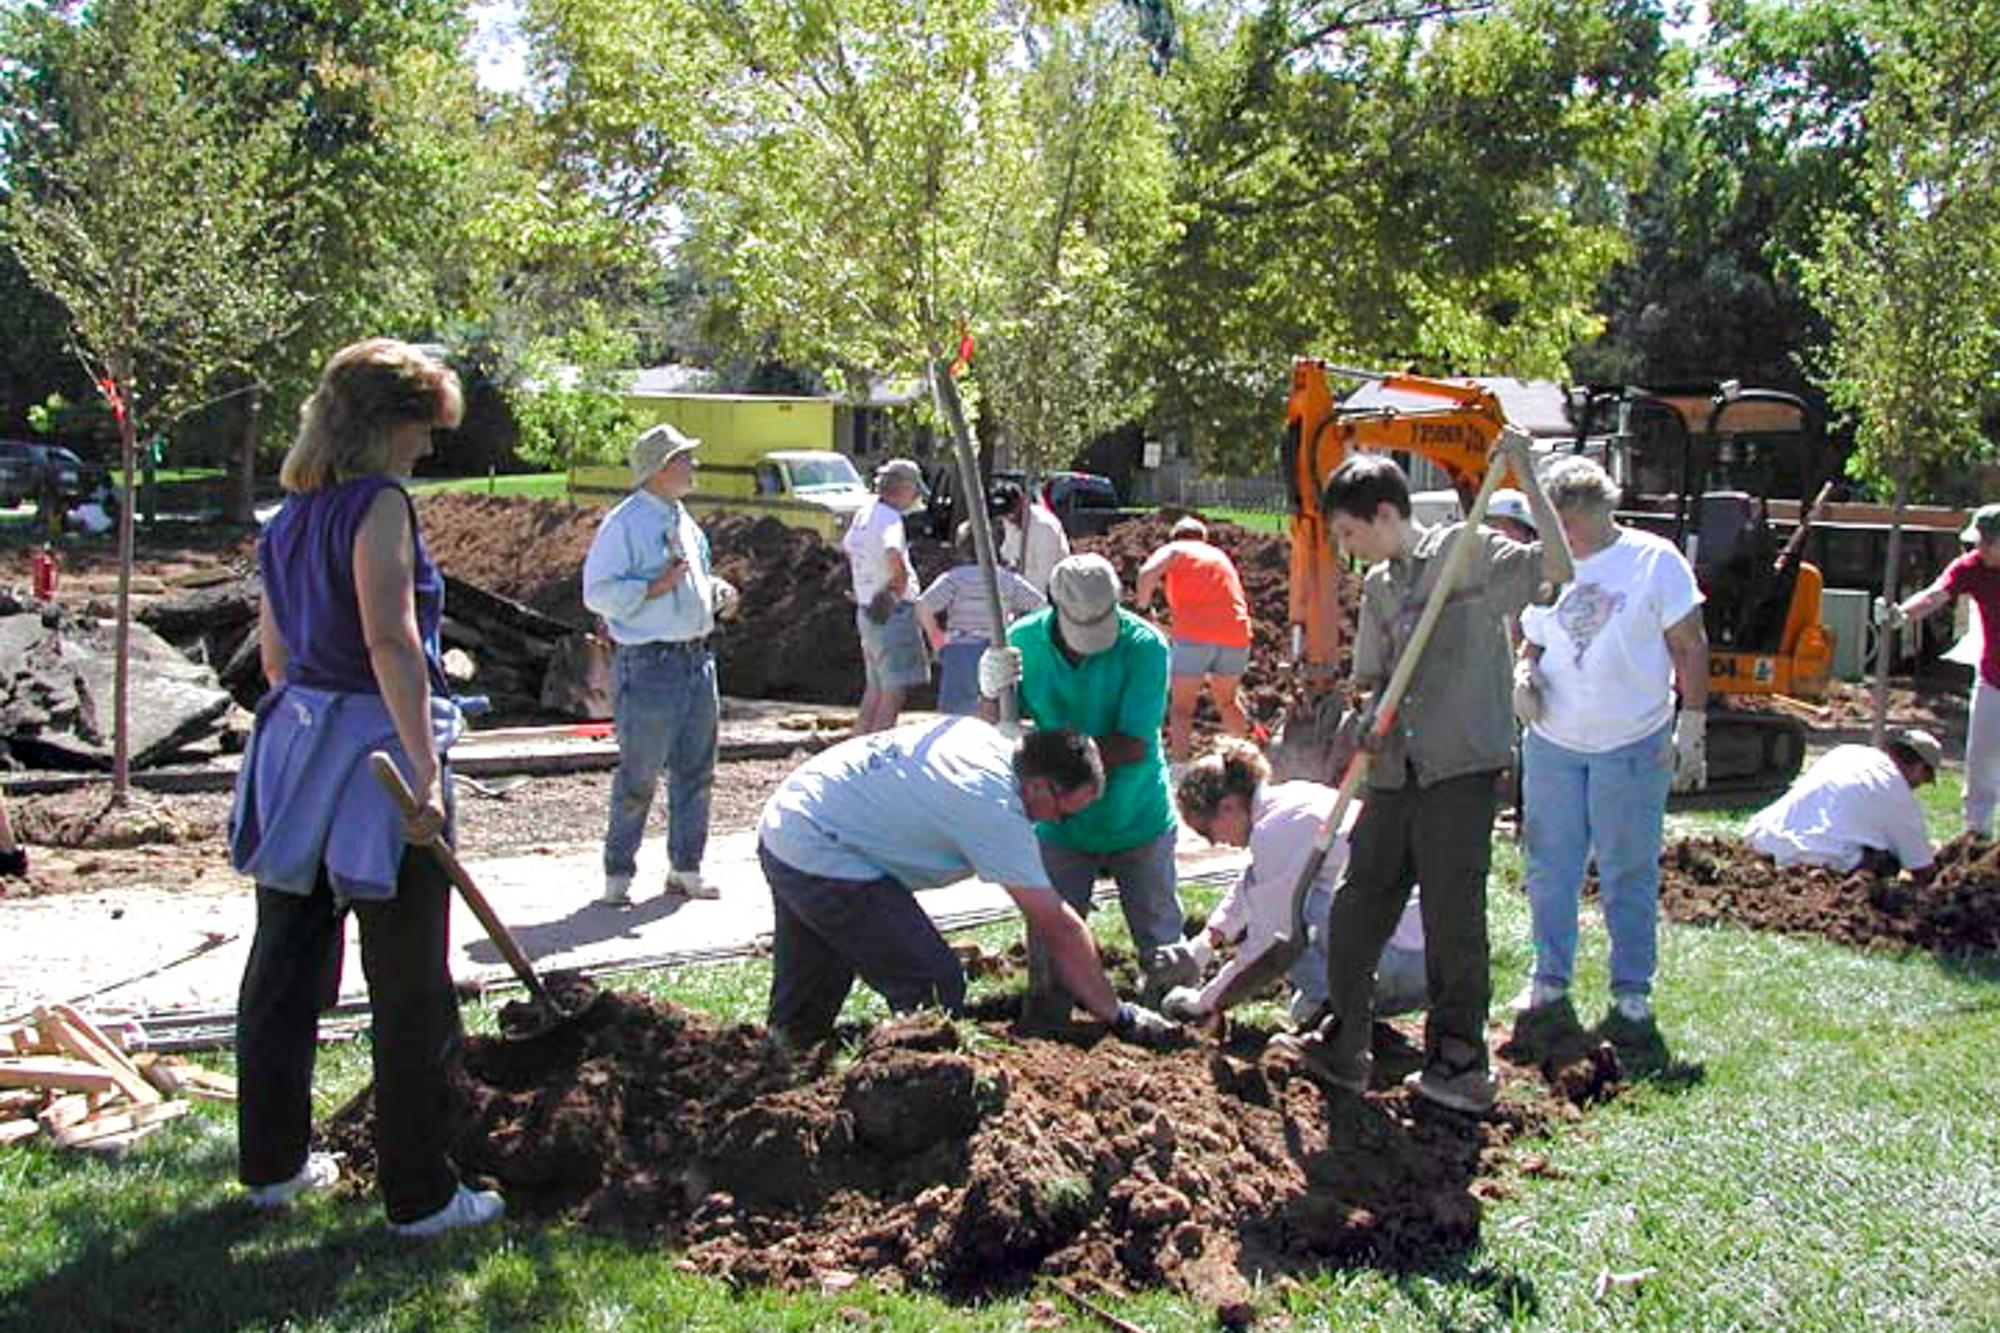 Volunteer tree planting, strengthening communities